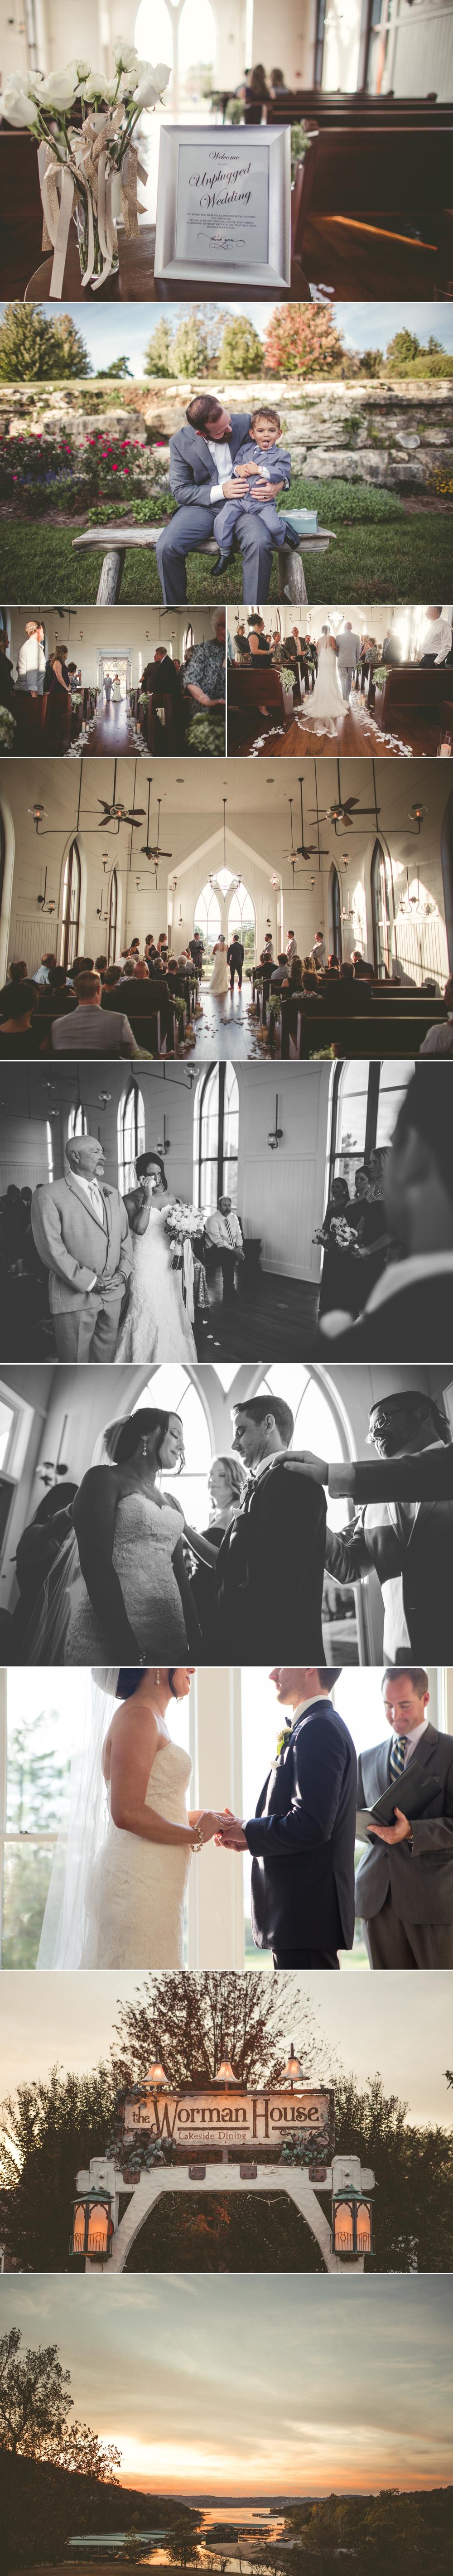 jason_domingues_photography_-best_kansas_city_photographer_big_cedar_lodge_wedding_ozark_kc_missouri_0003